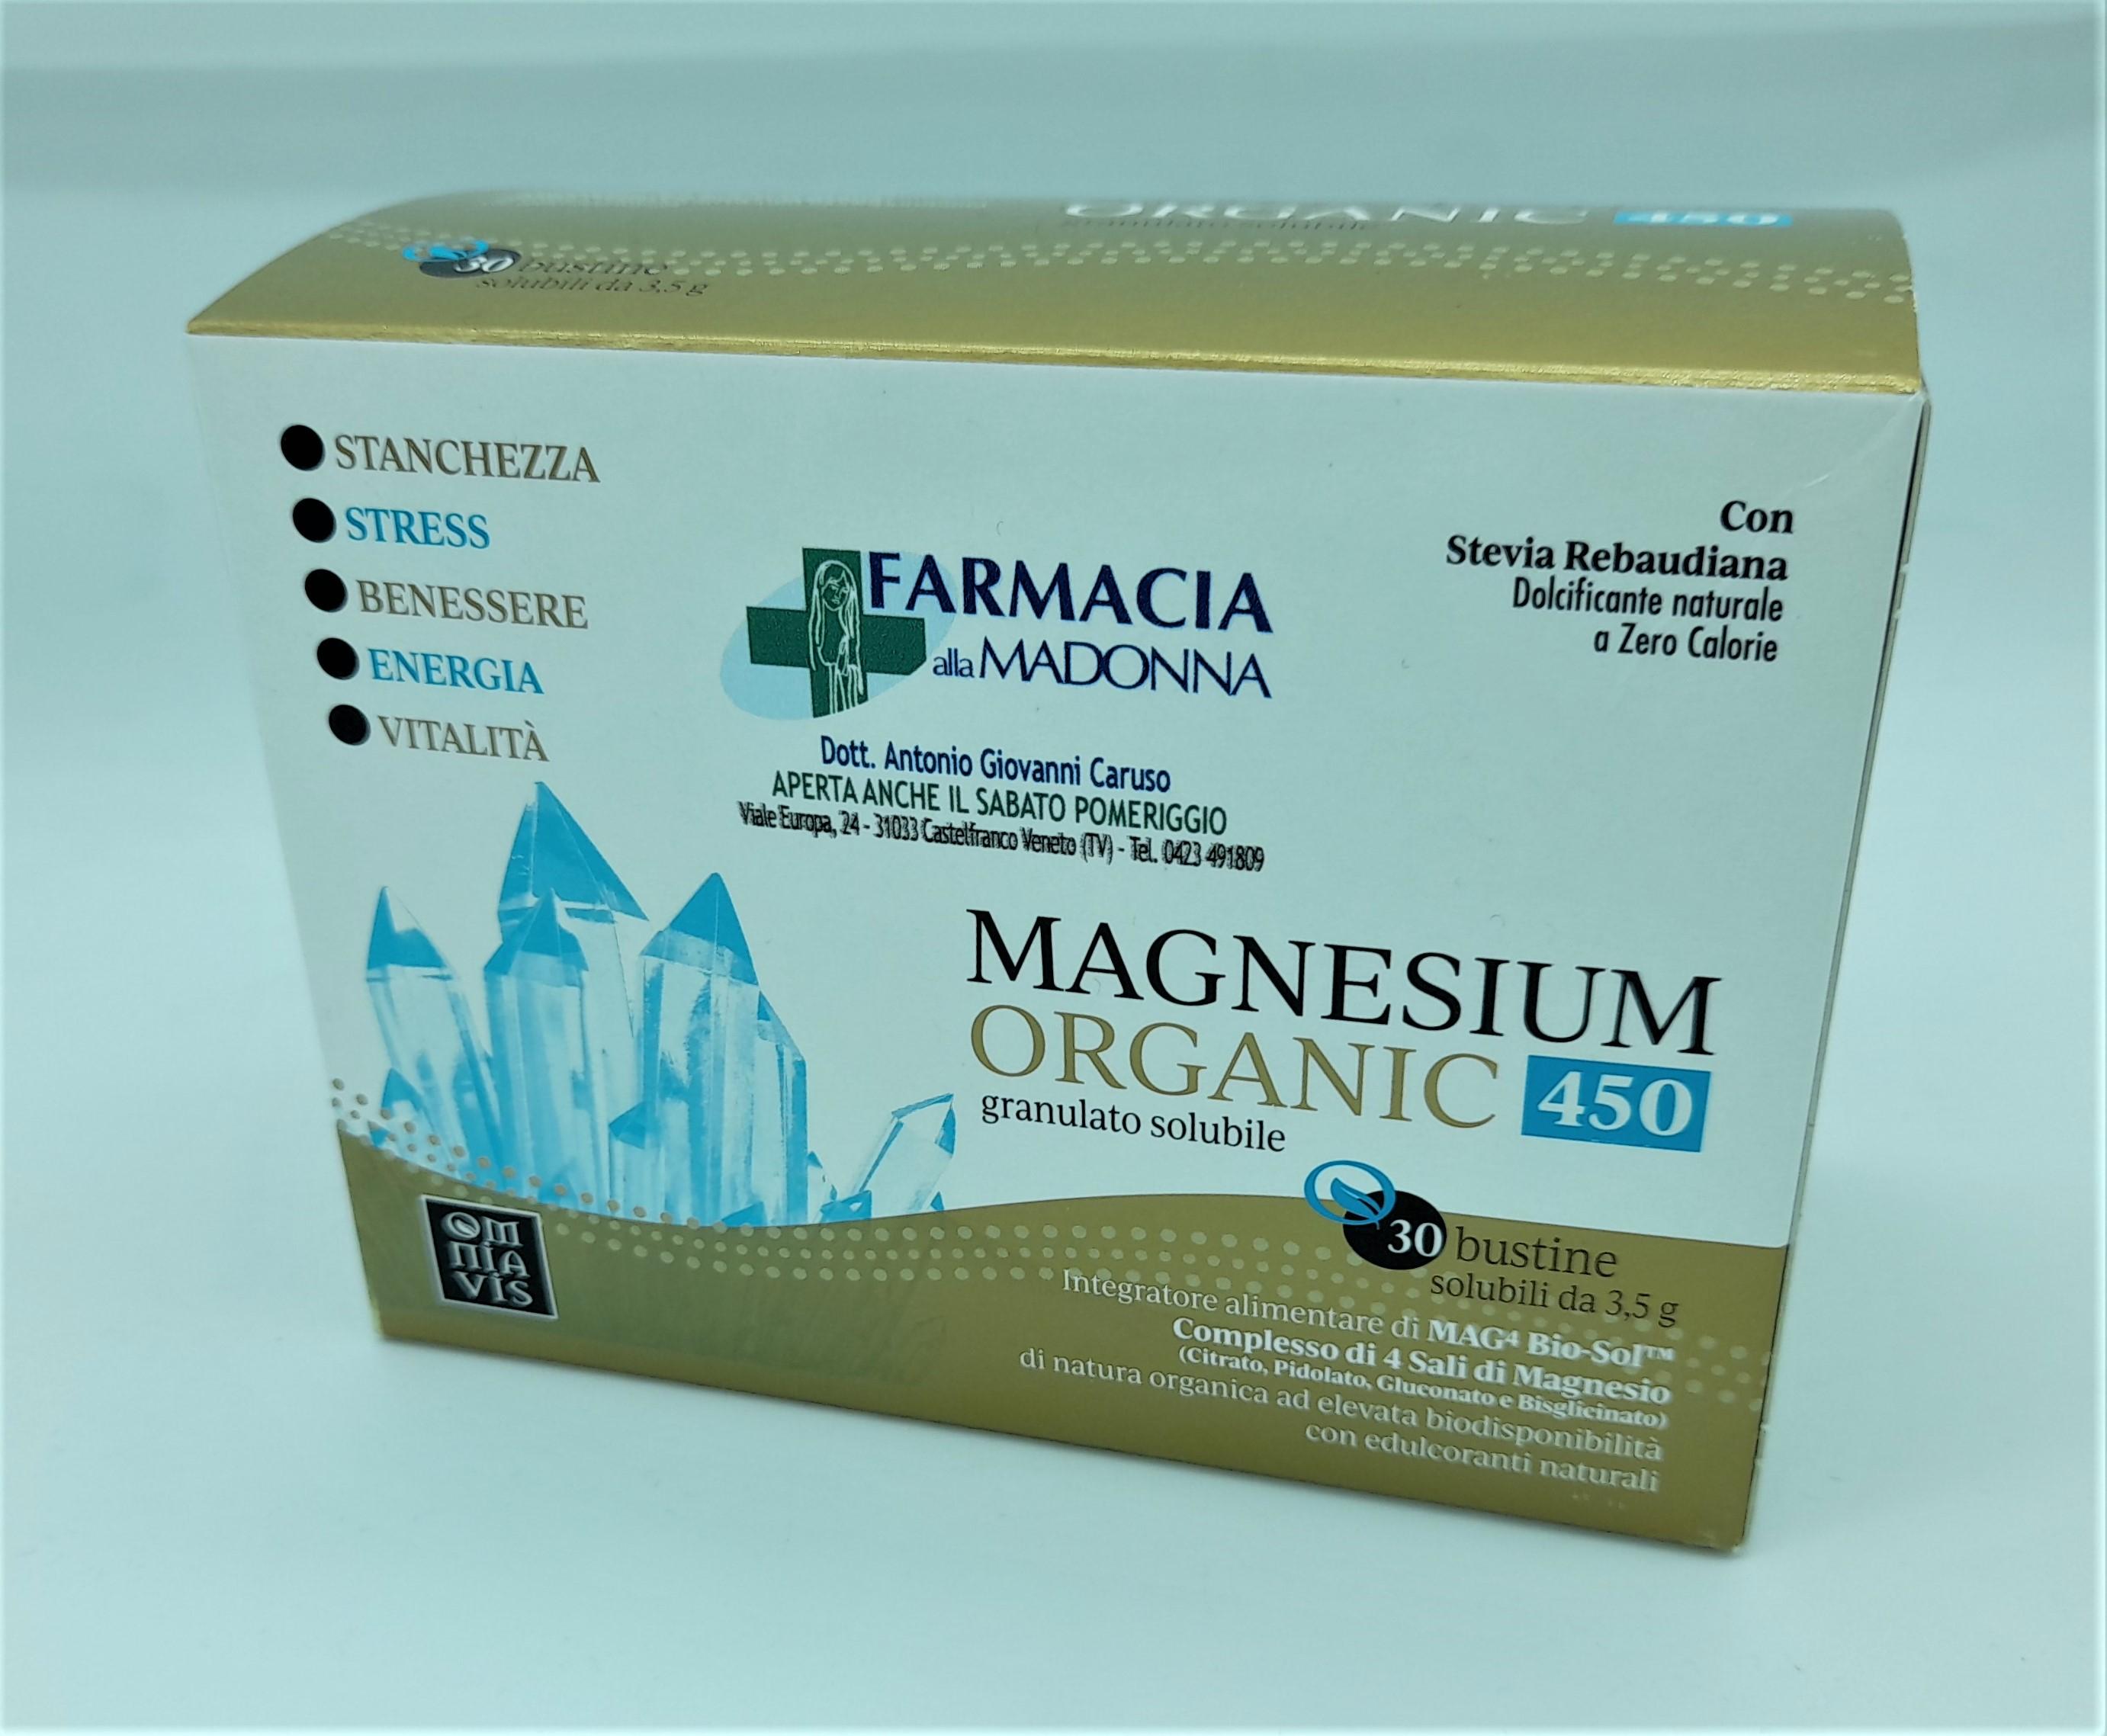 MAGNESIUM ORGANIC 450, Farmacia alla Madonna